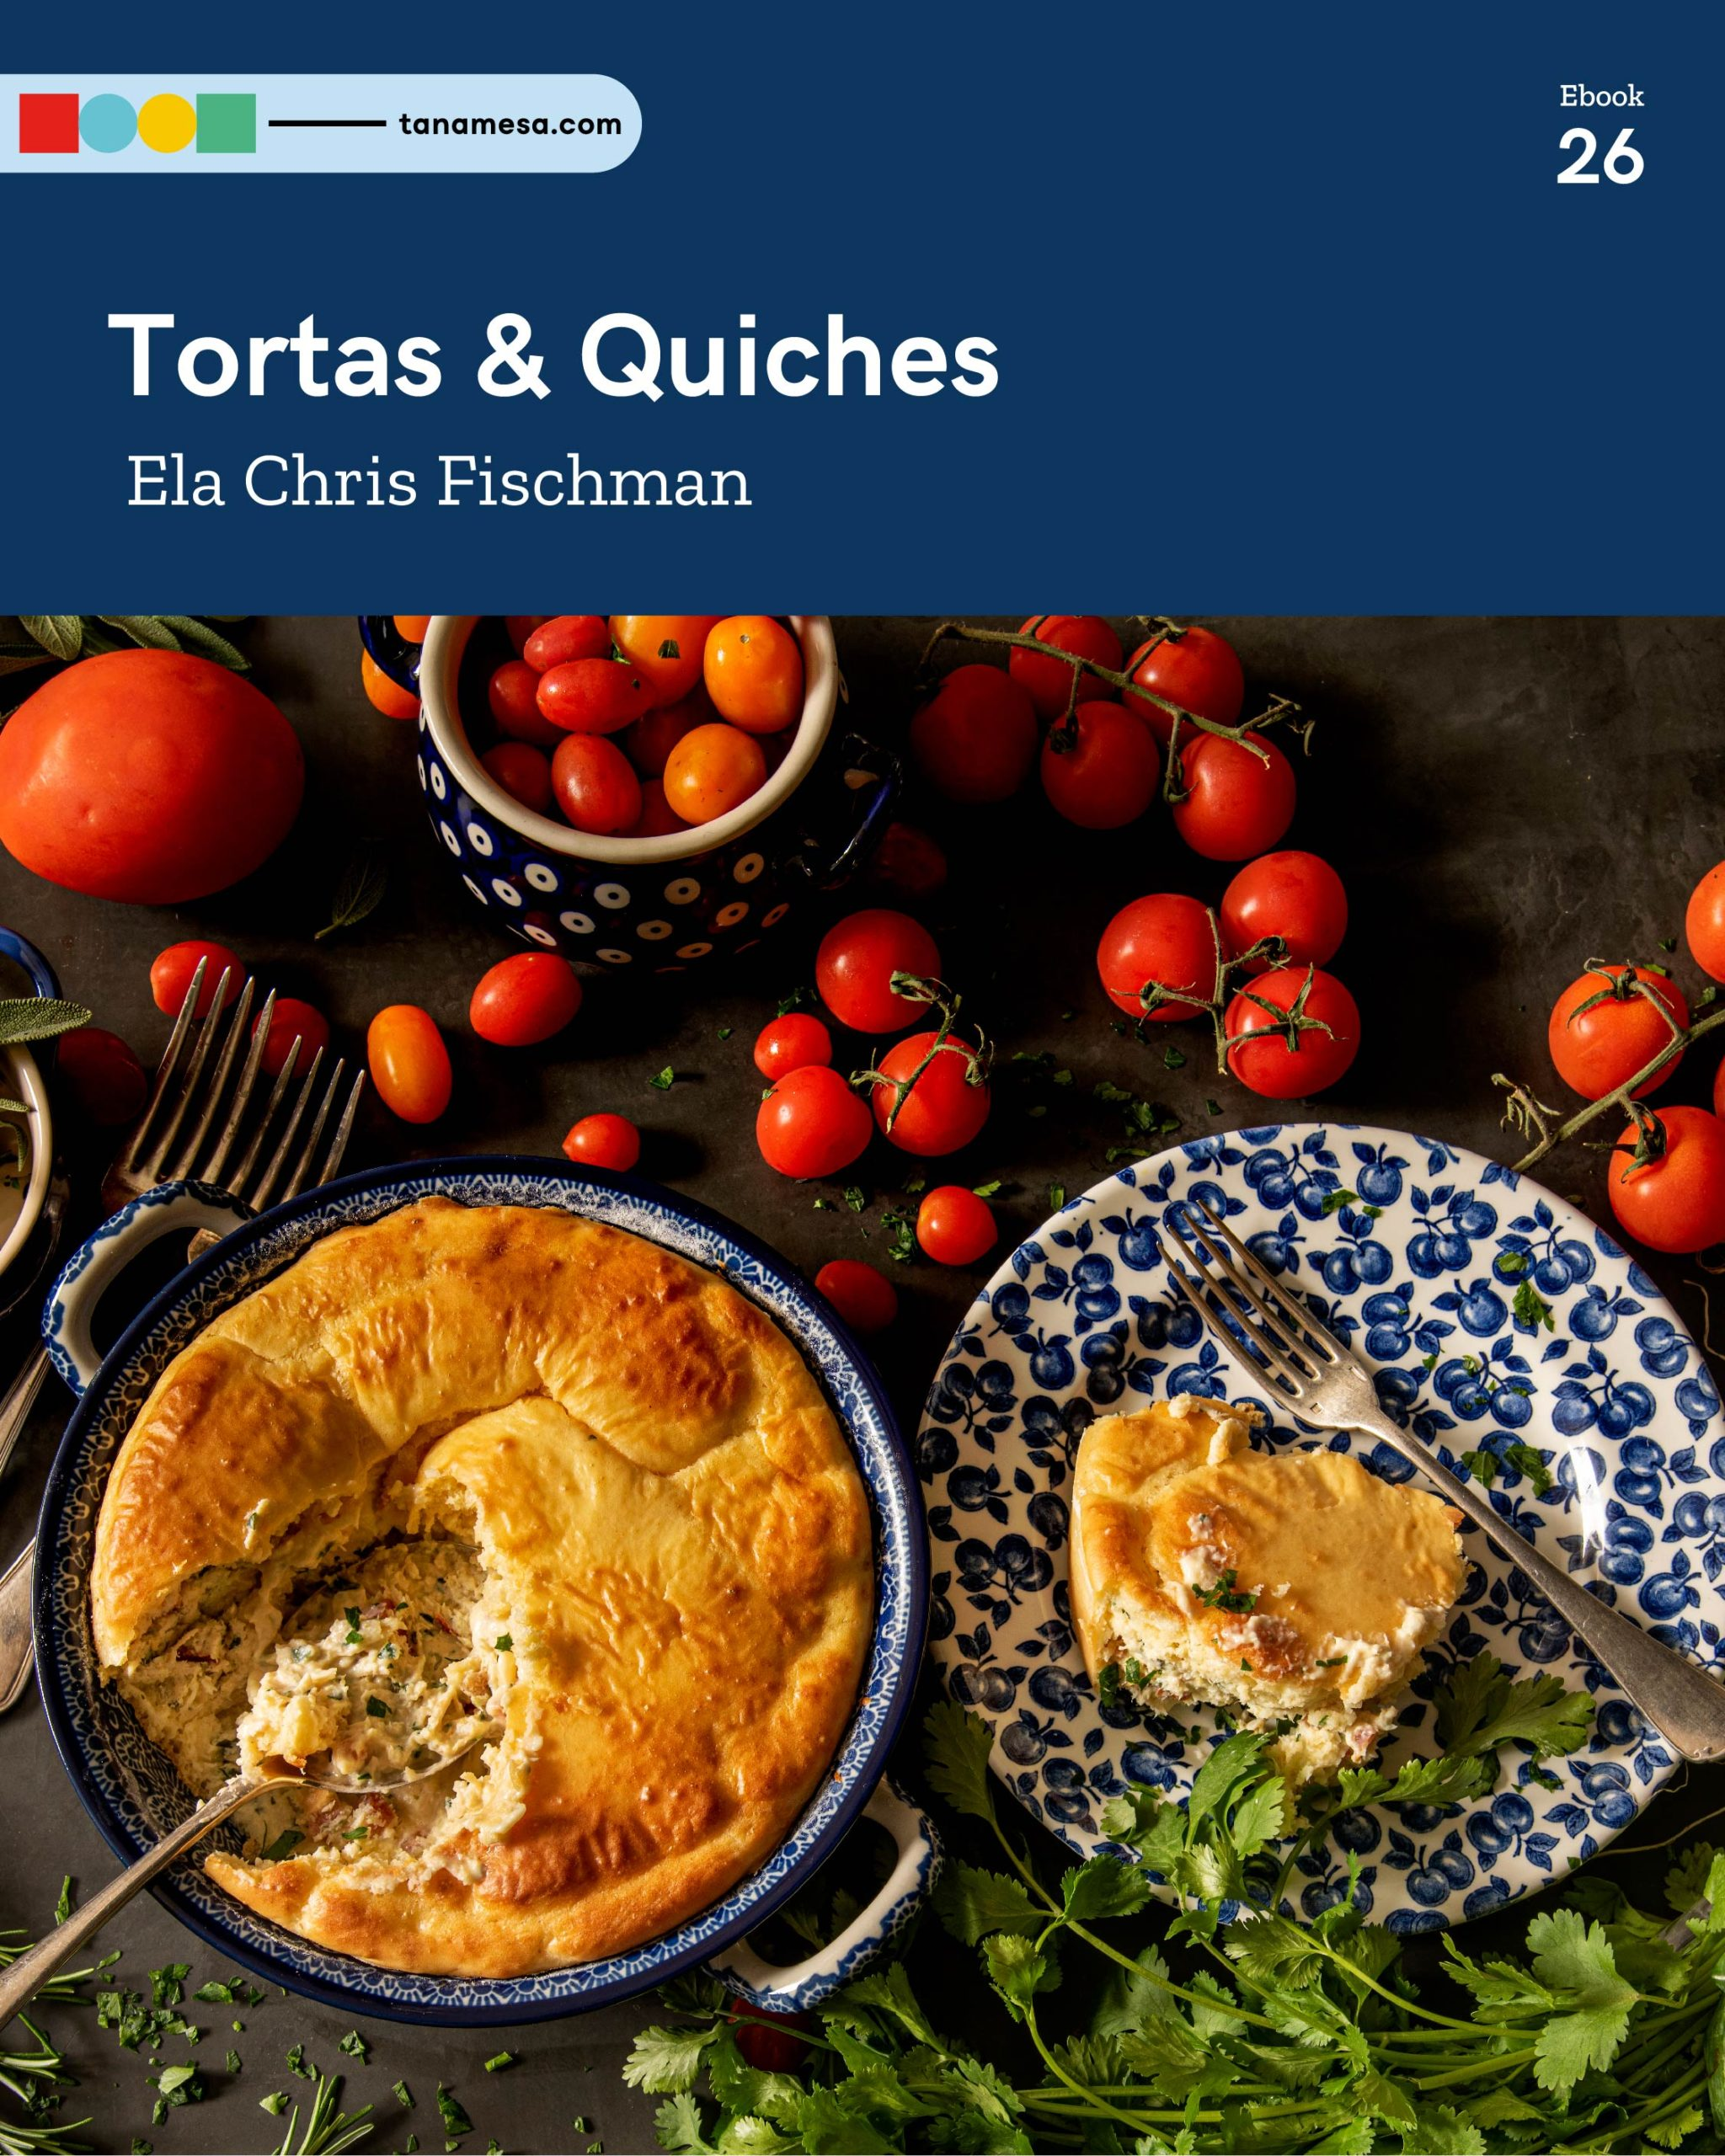 Tortas & Quiches